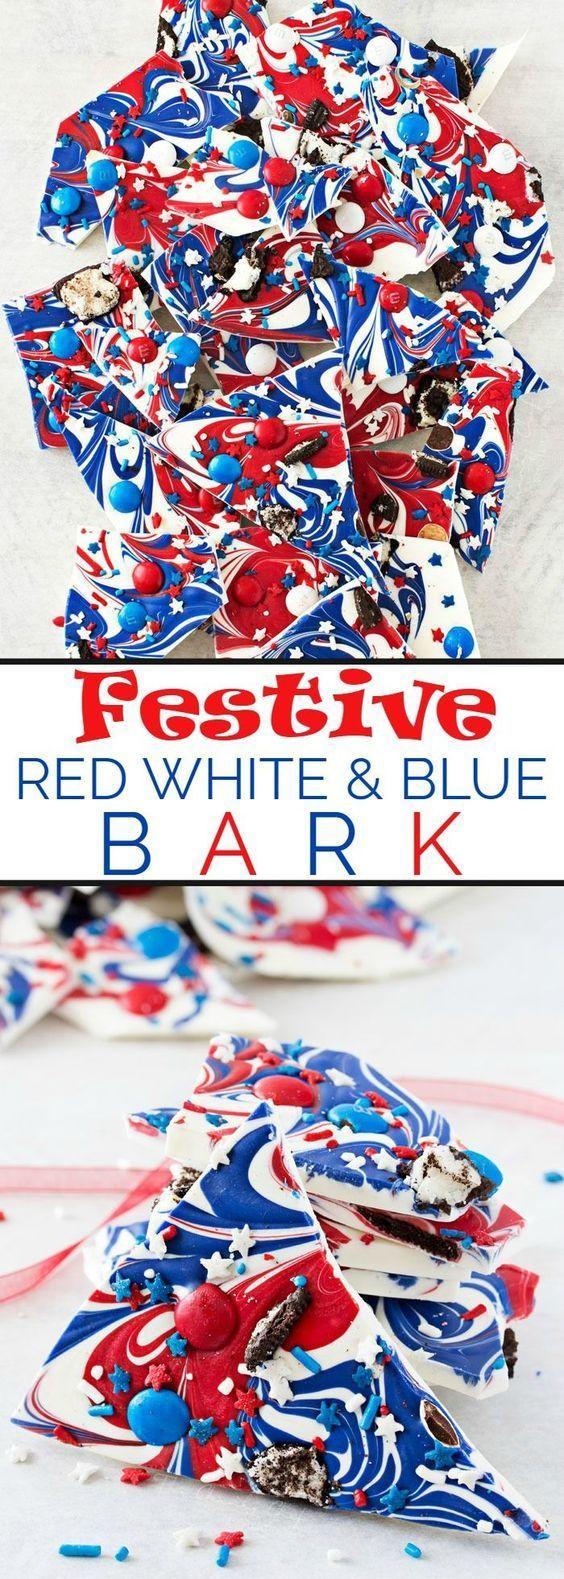 Red White And Blue Bark desserts memorialday Patriotic